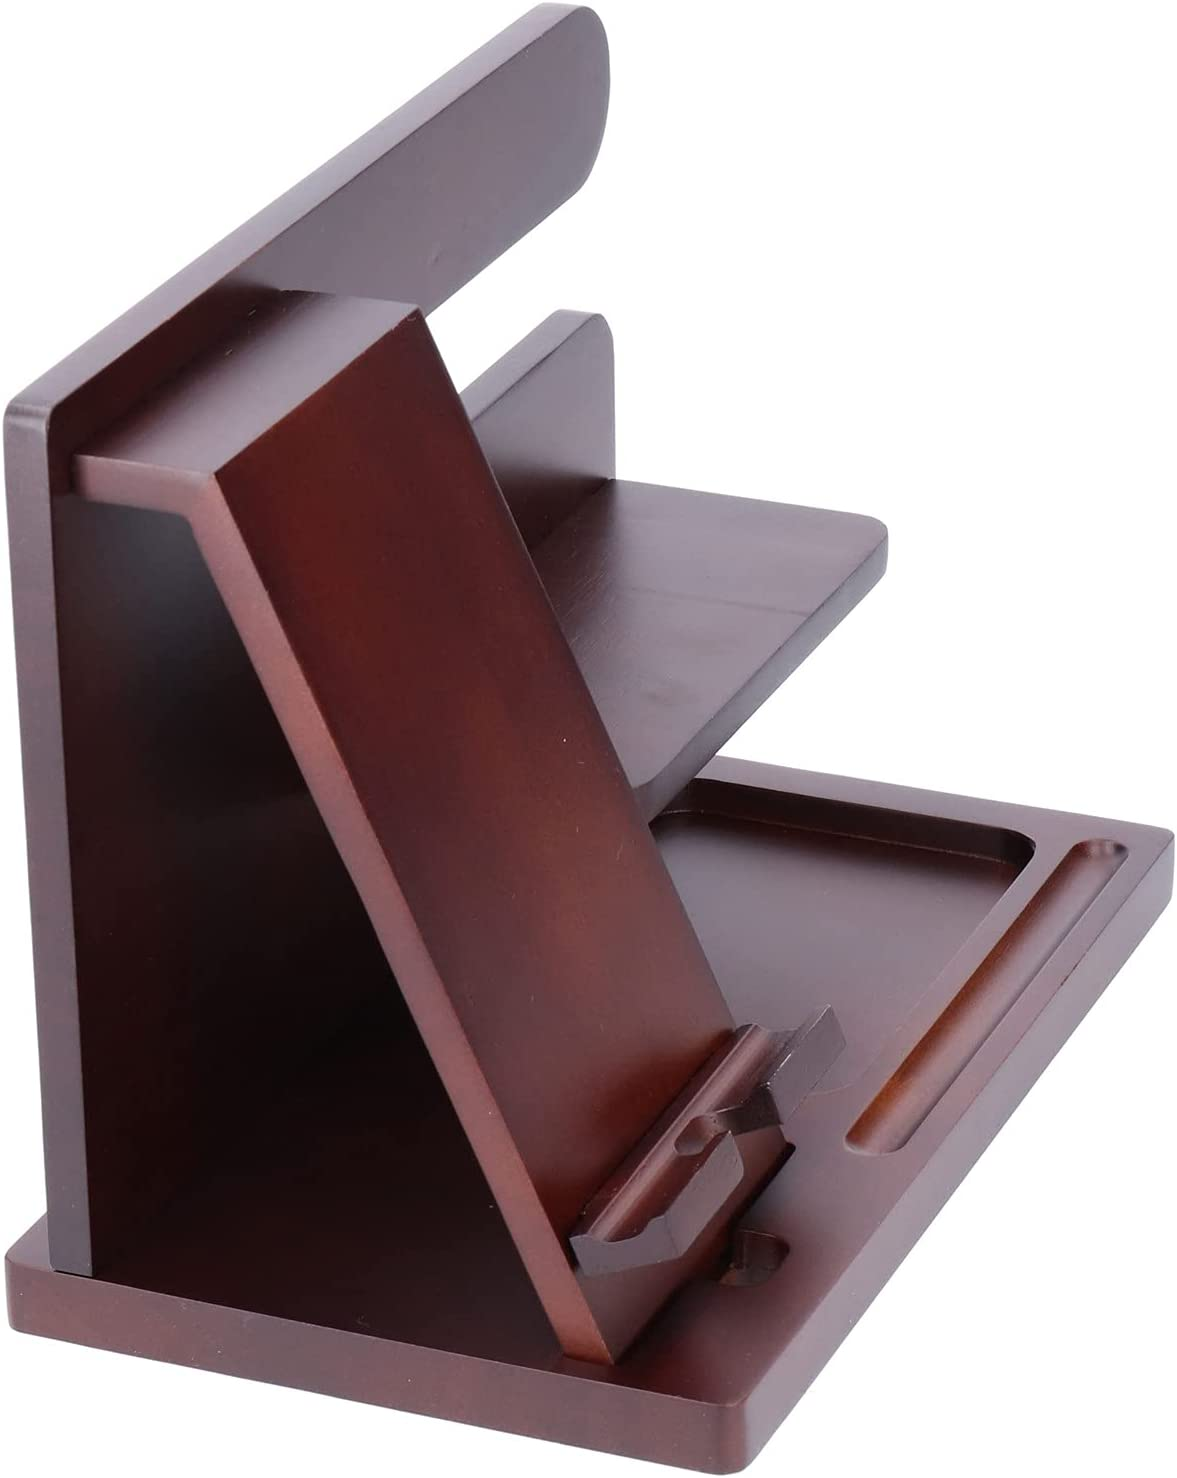 Wood Phone Storage Bracket Portable discount Organiz Holder safety Stand Tablet